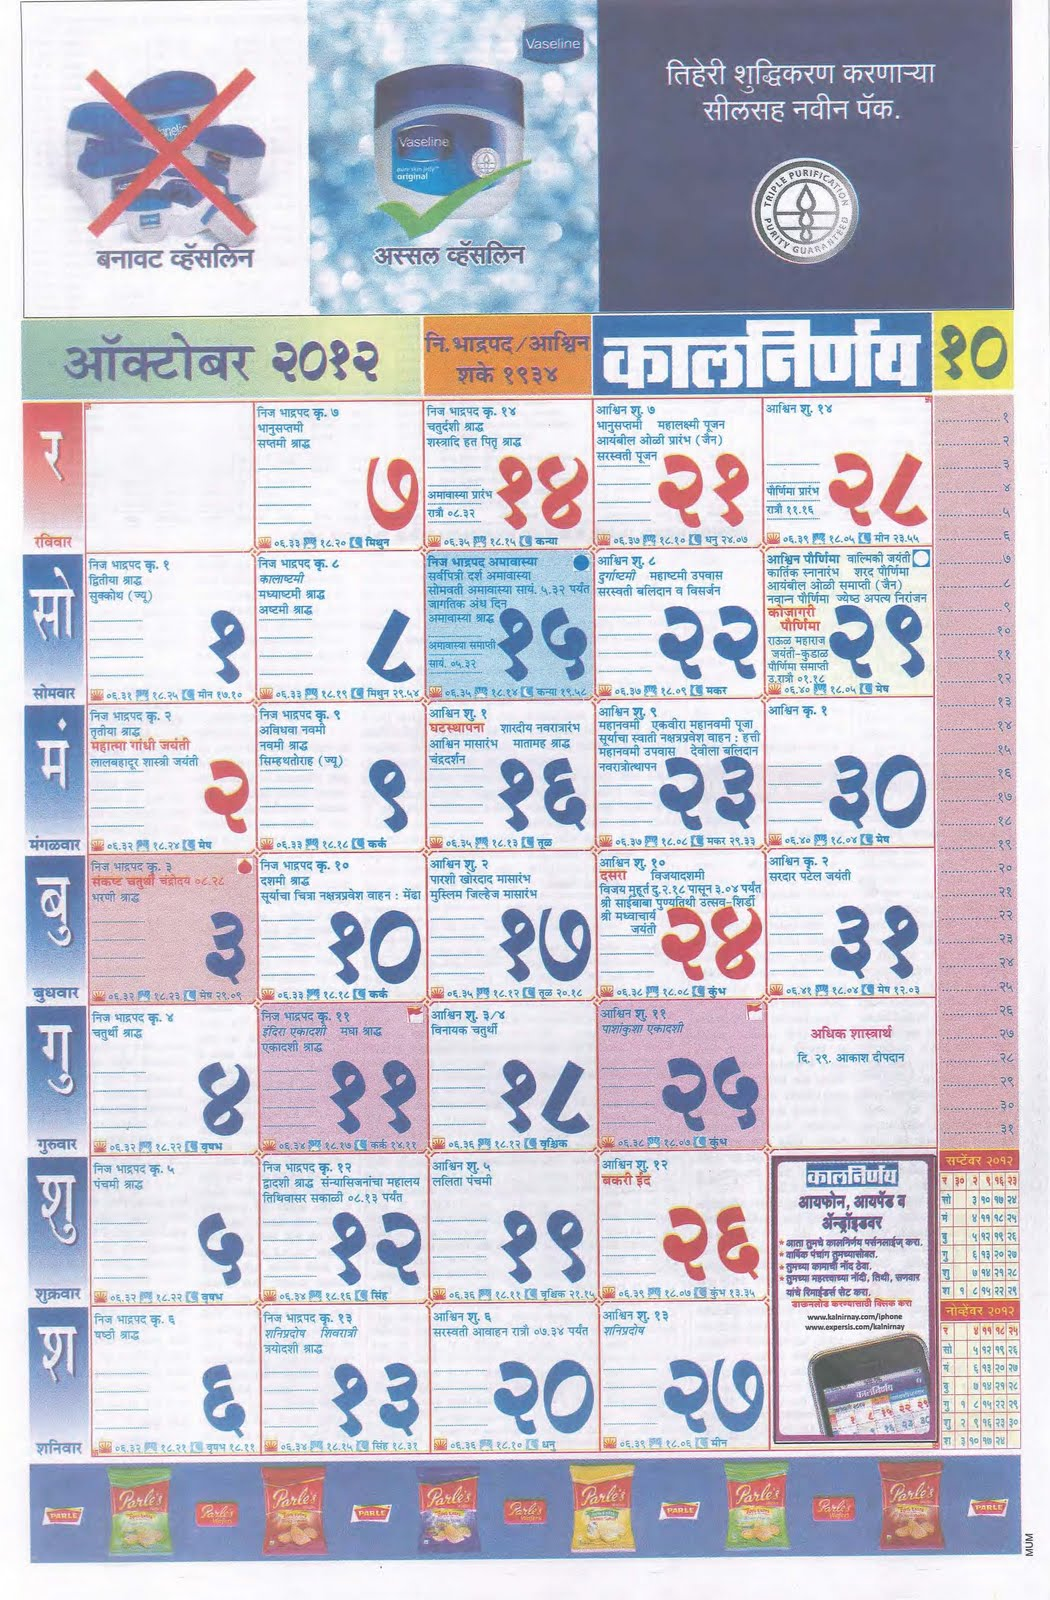 February 2019 calendar marathi